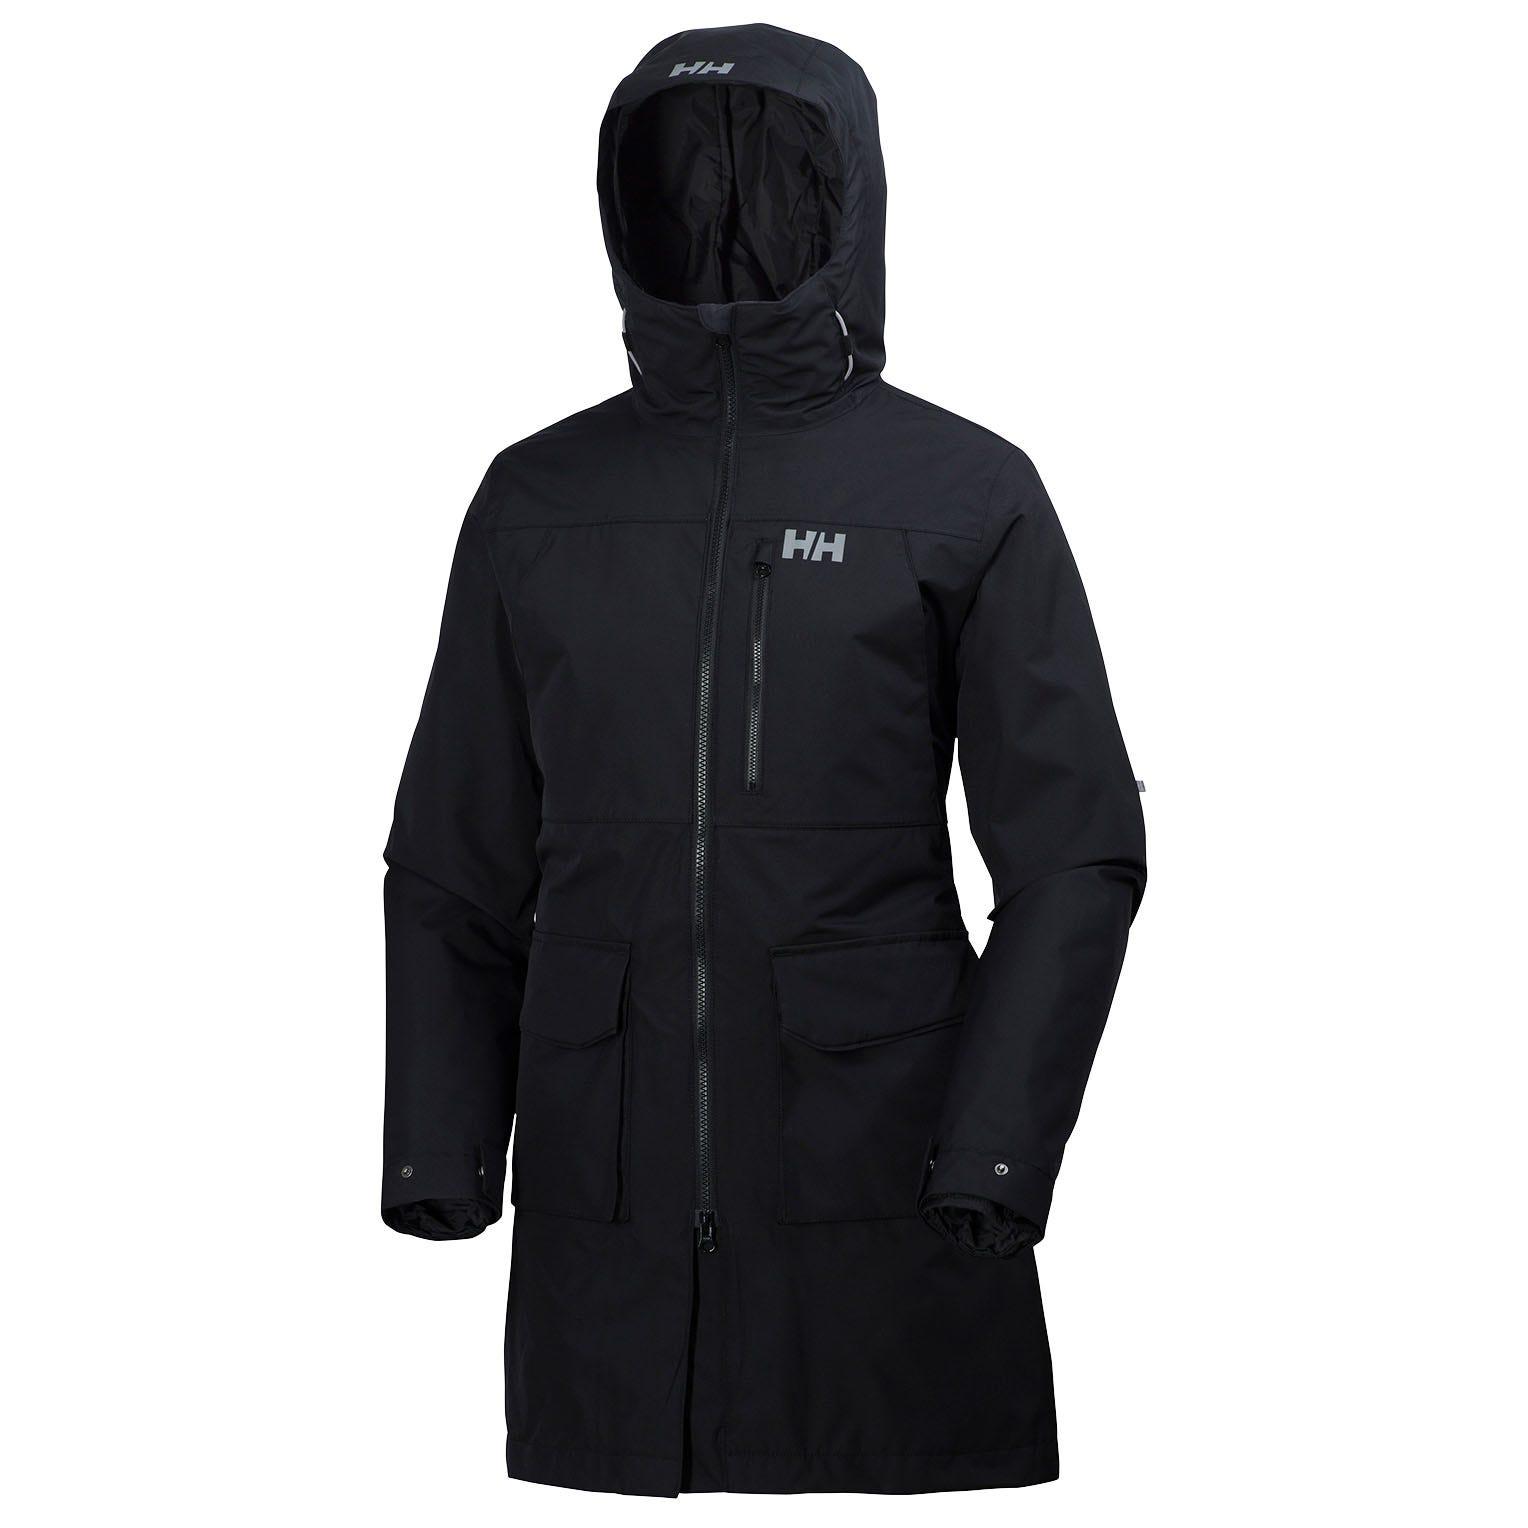 Helly-Hansen Womens Rigging Waterproof Breathable Rain Coat Jacket with Hood